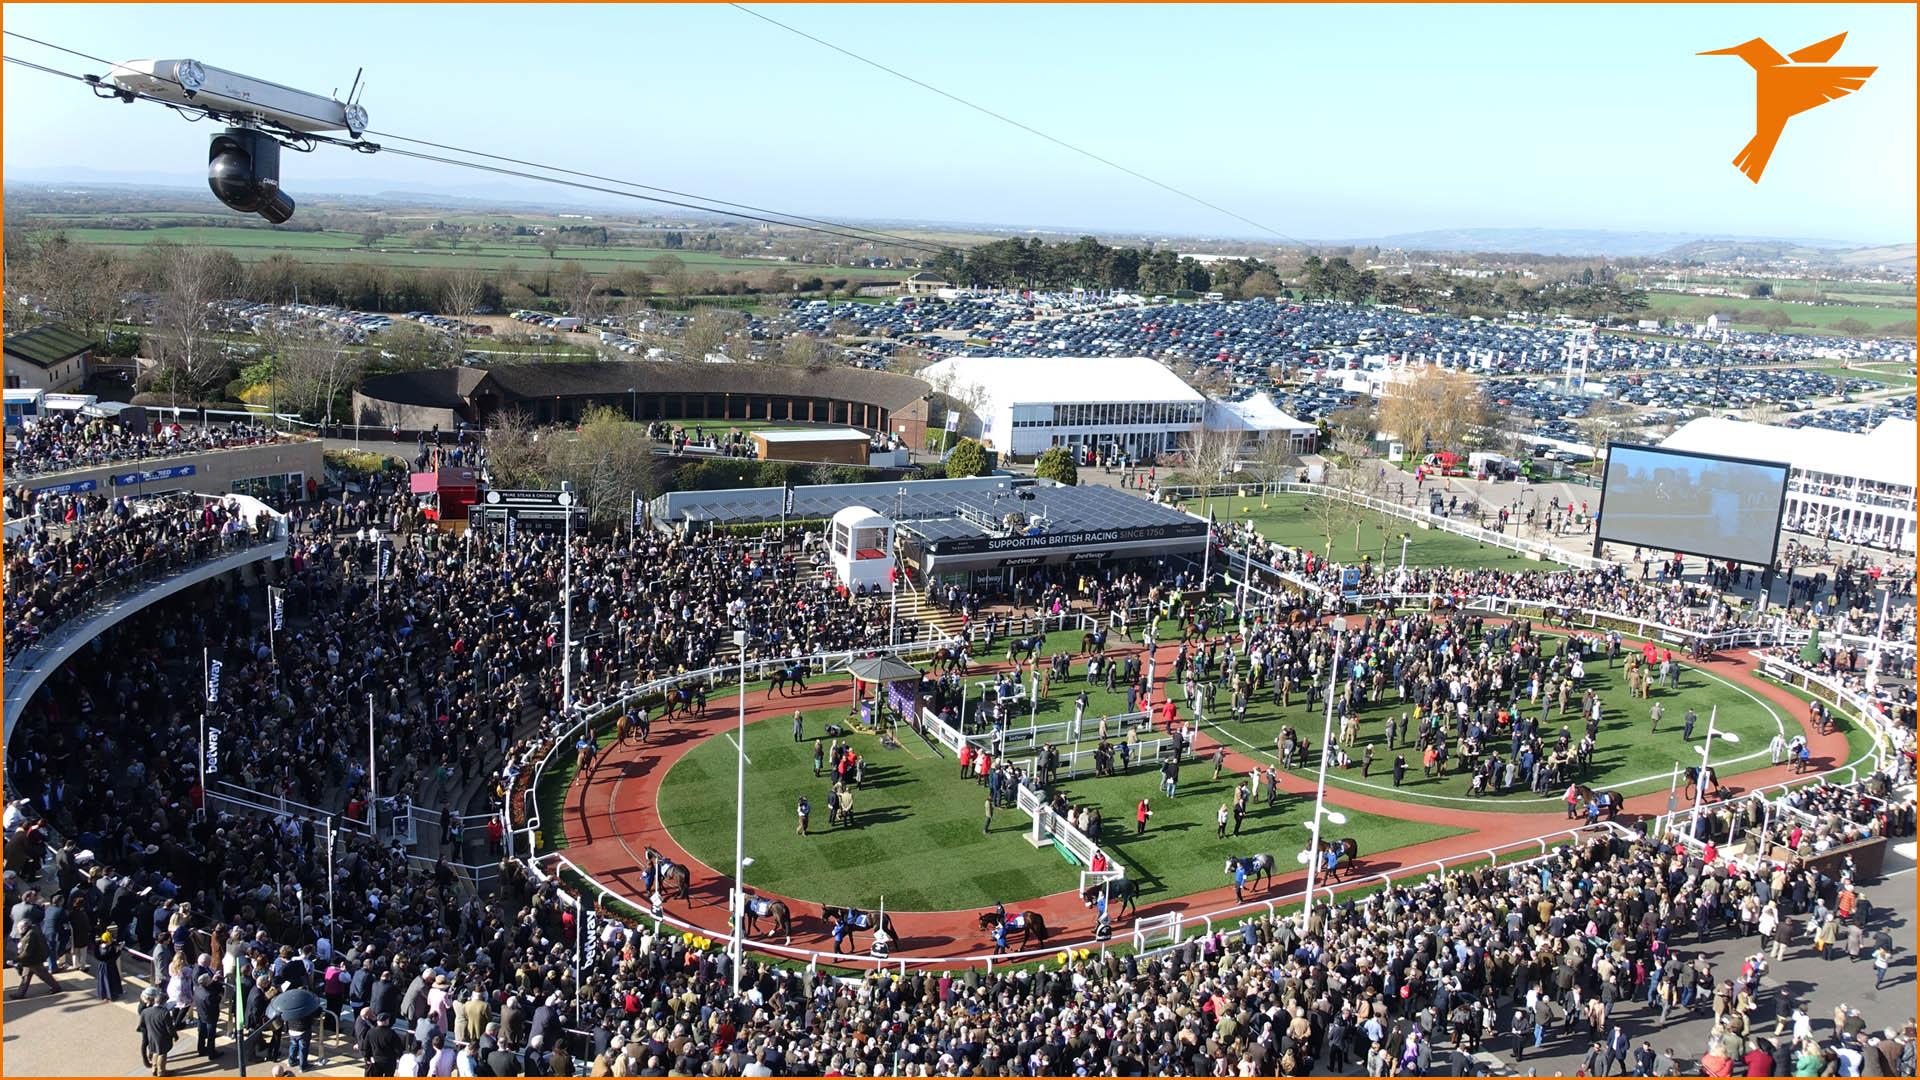 Ascot, Royal Ascot, Pferderennen, horse race, Cheltenham, Colibri WireCam, cablecam, wirecam, flycam, Seilkamera, Kameraseilbahn